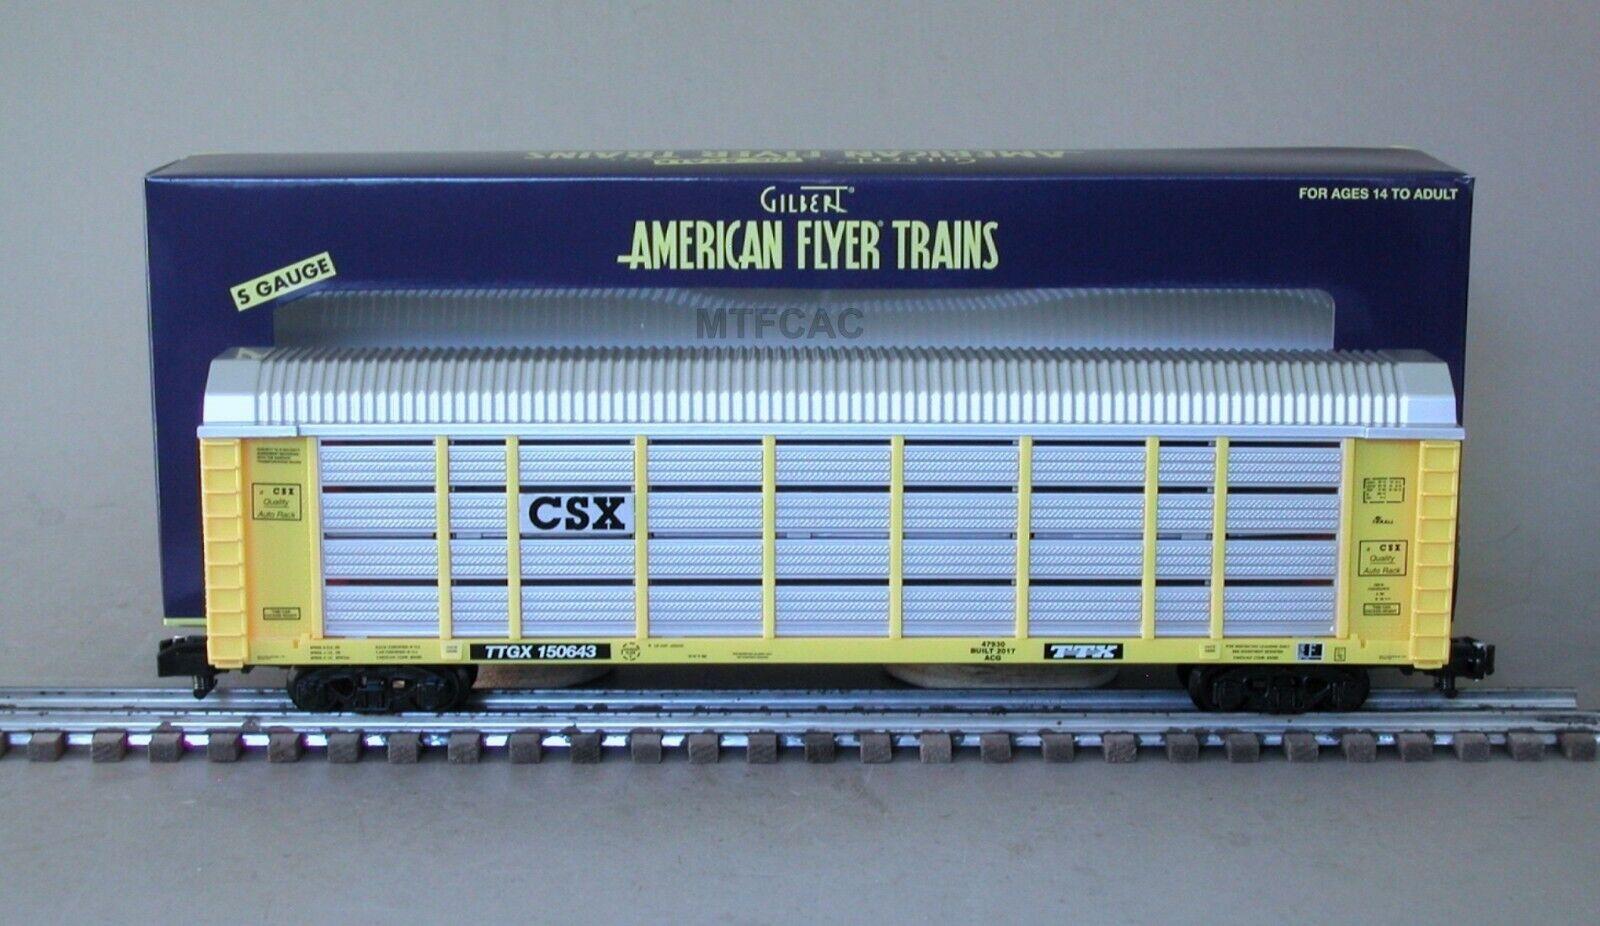 American Flyer 6-47930 CSX Auto Carrier por Lionel ttgx 150643